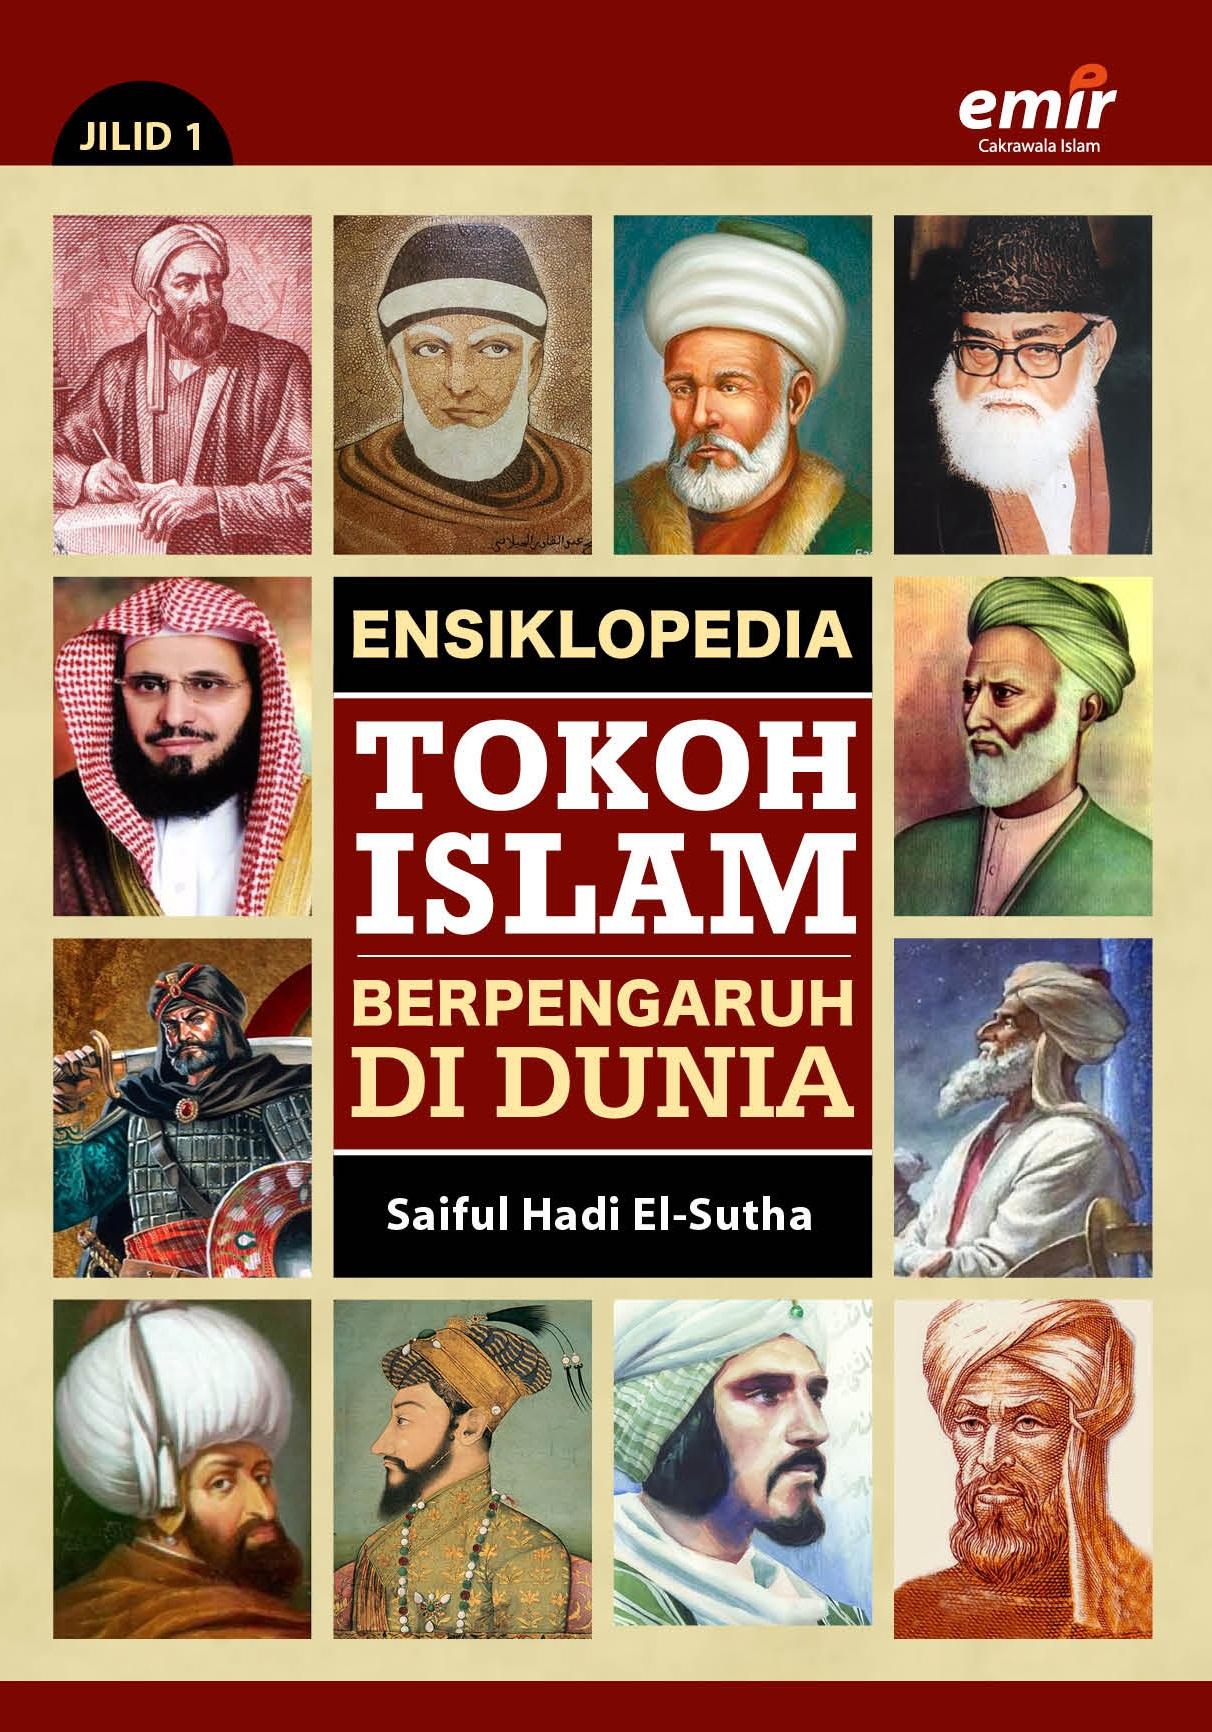 Ensiklopedia Tokoh Islam Berpengaruh di Dunia (Jilid 1)